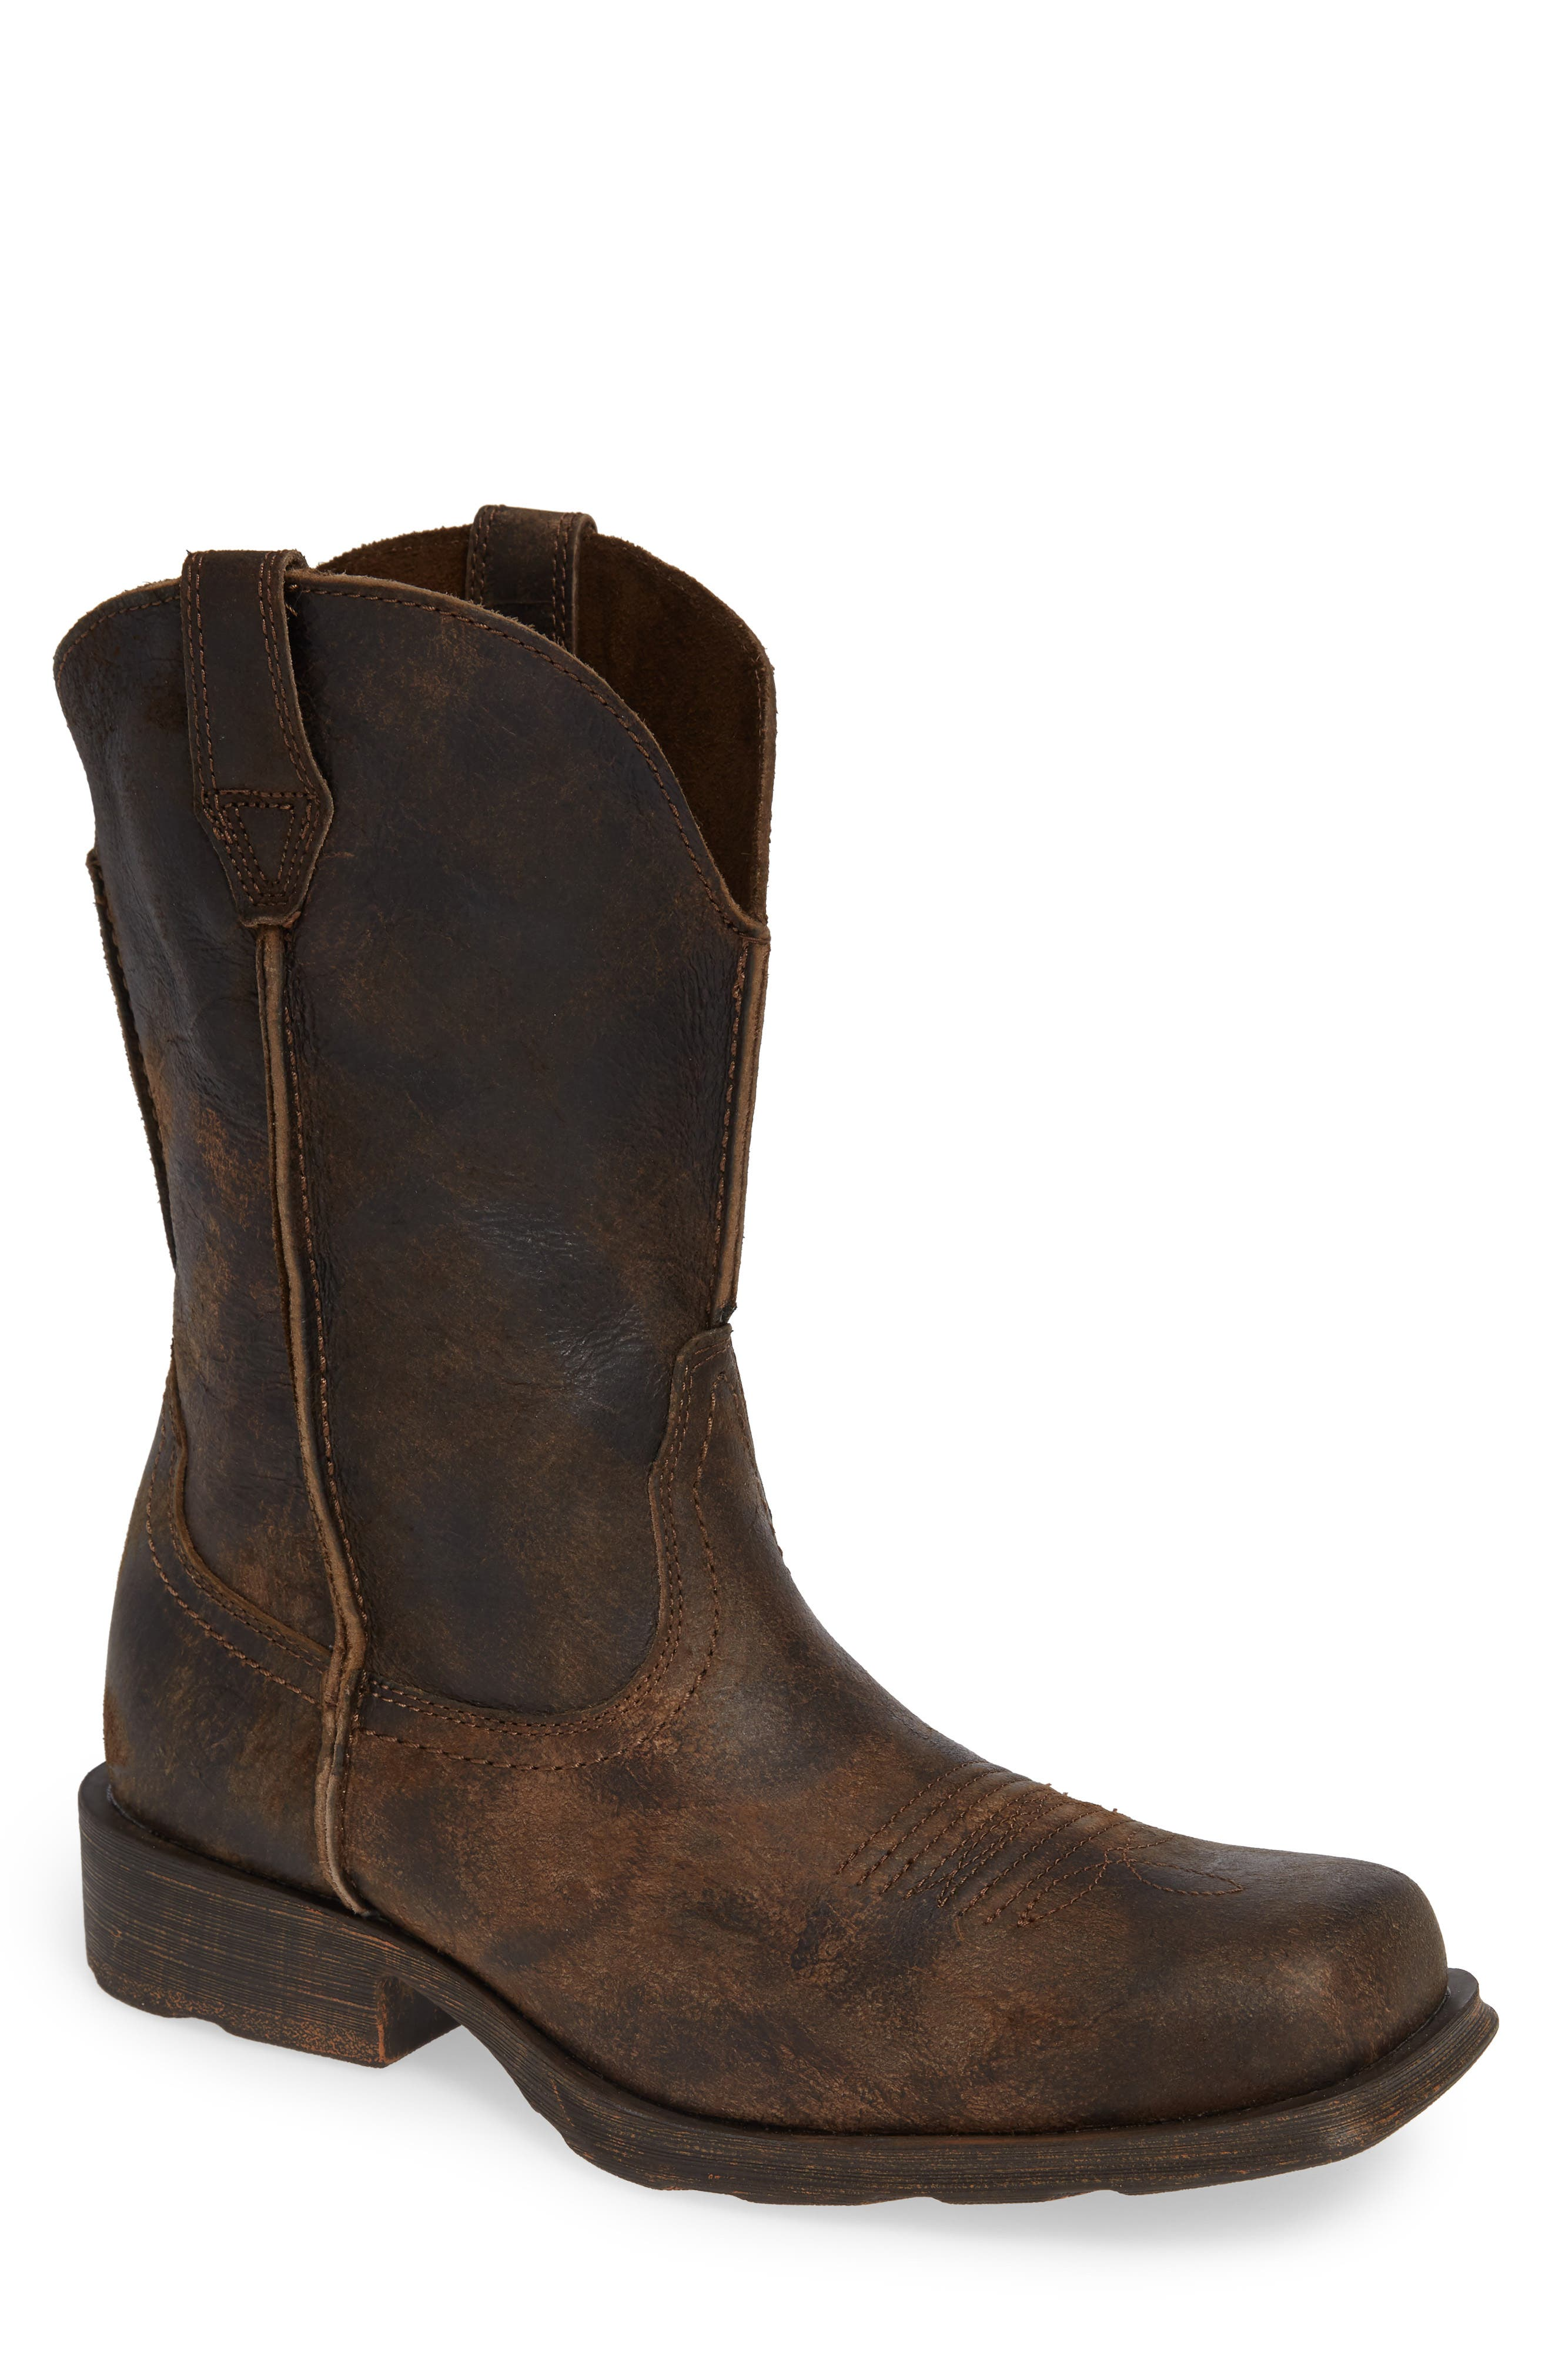 Ariat Rambler Boot, Grey